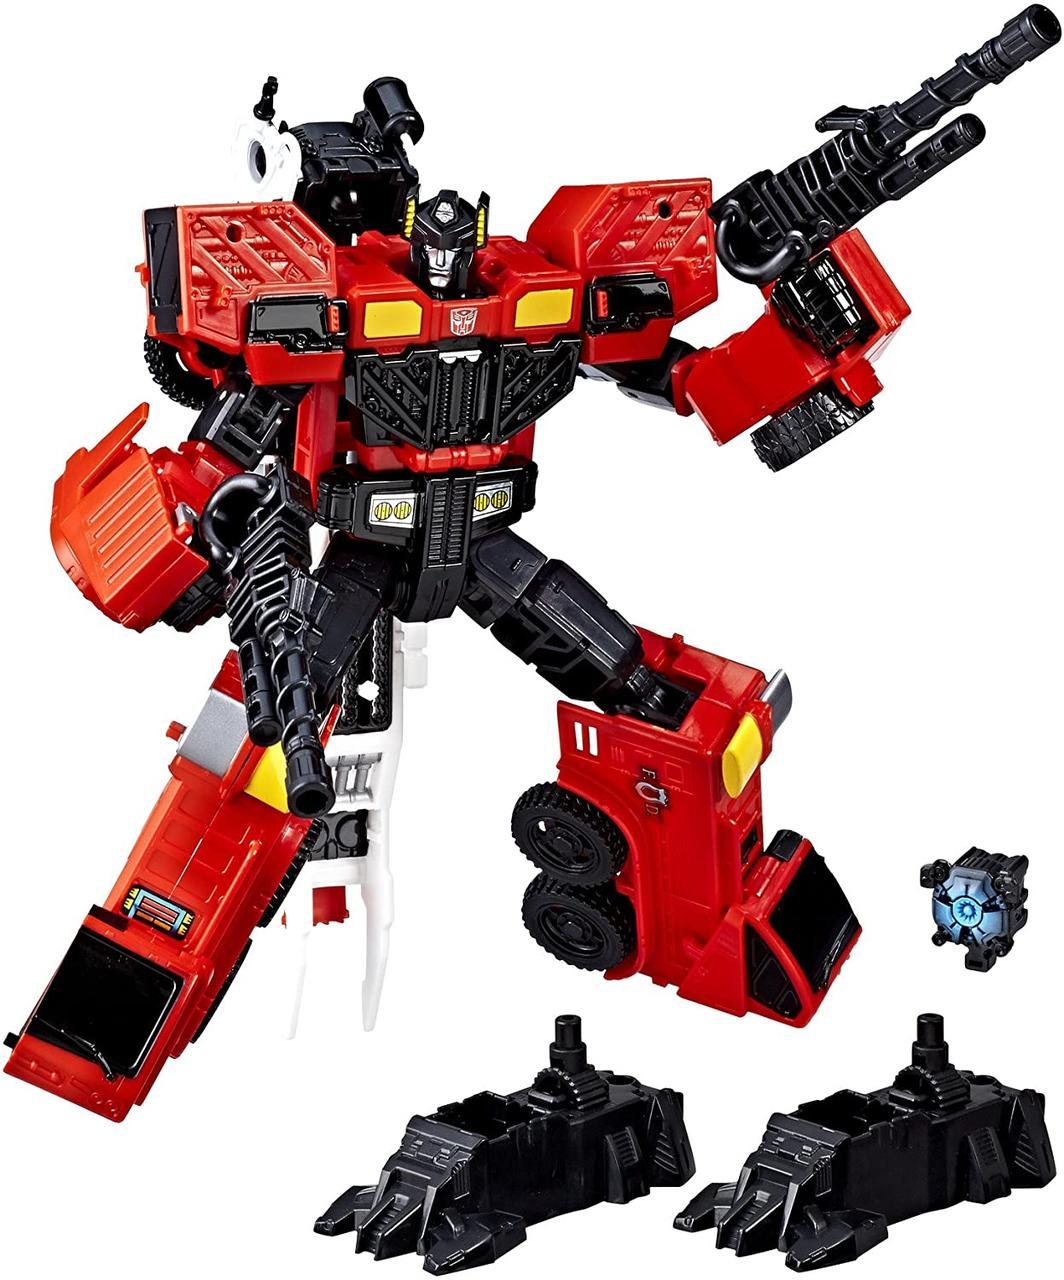 Трансформер Transformers Инферно Сила Праймов Generations Power of the Primes Voyager Class Inferno